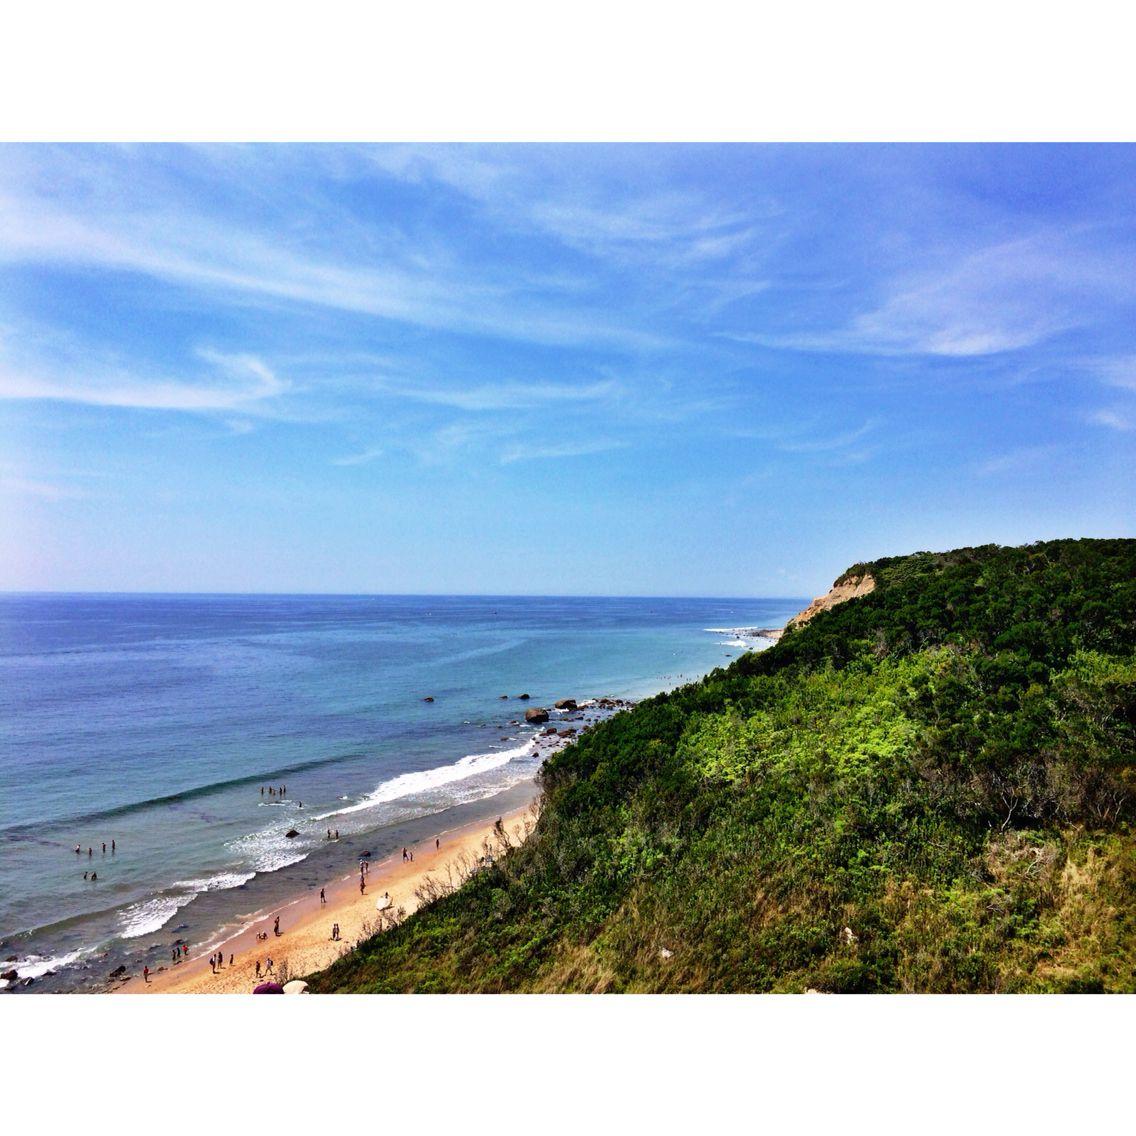 Mohegan Bluffs Block Island, Rhode Island